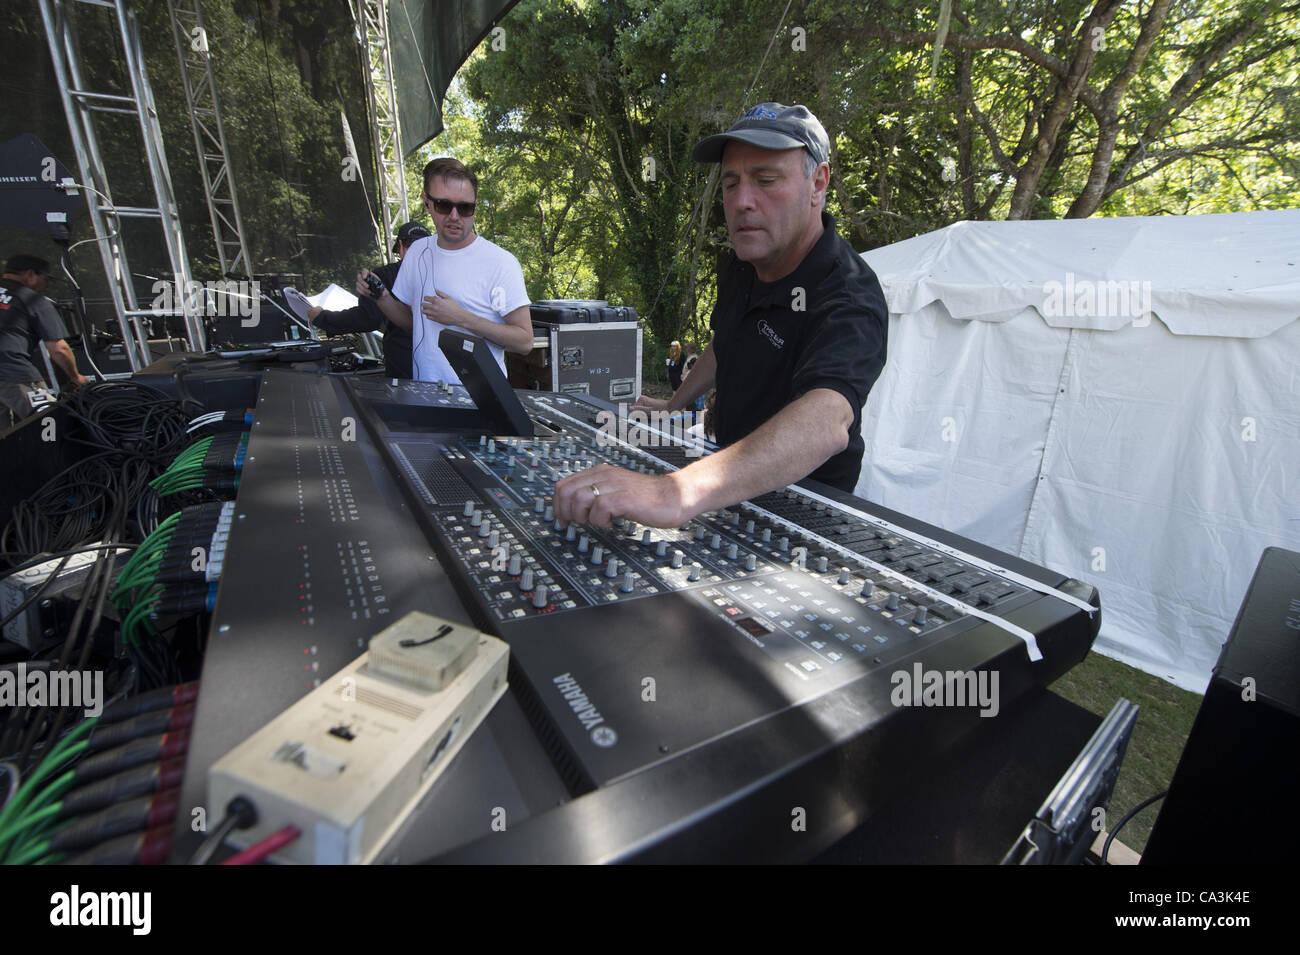 May 27, 2012 - Aptos, CA, USA - Soundboard at the 20th annual Santa Cruz Blues Festival. (Credit Image: © Jerome - Stock Image